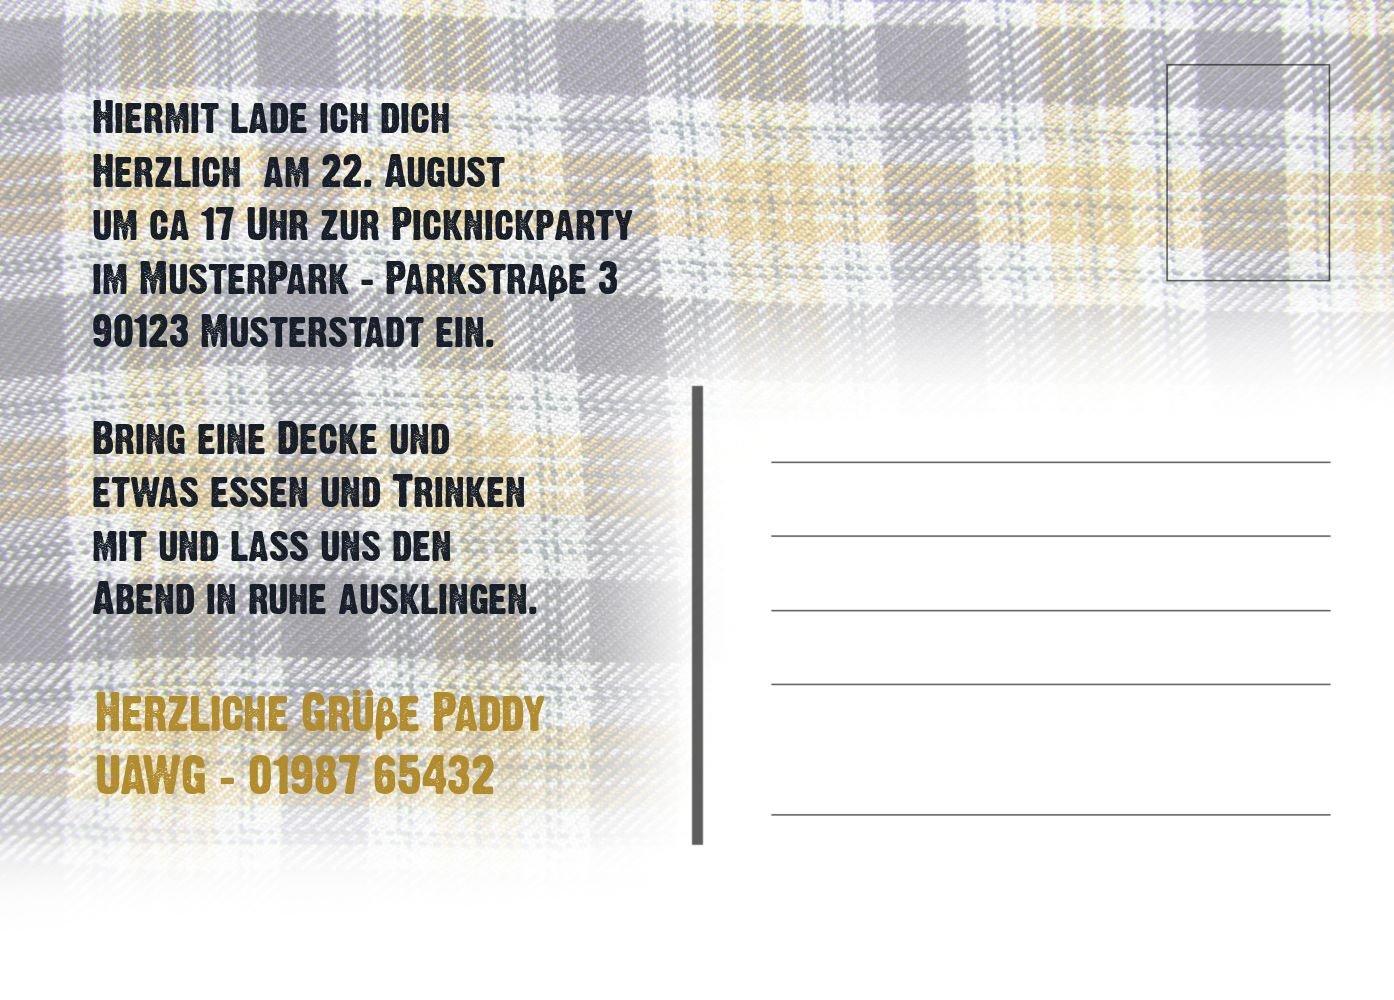 Einladung Sommerfest Picknickdecke, 60 Karten, HellBlau B073H4HR3H B073H4HR3H B073H4HR3H | Stilvoll und lustig  | Neues Design  | Outlet Online  2b1d2a